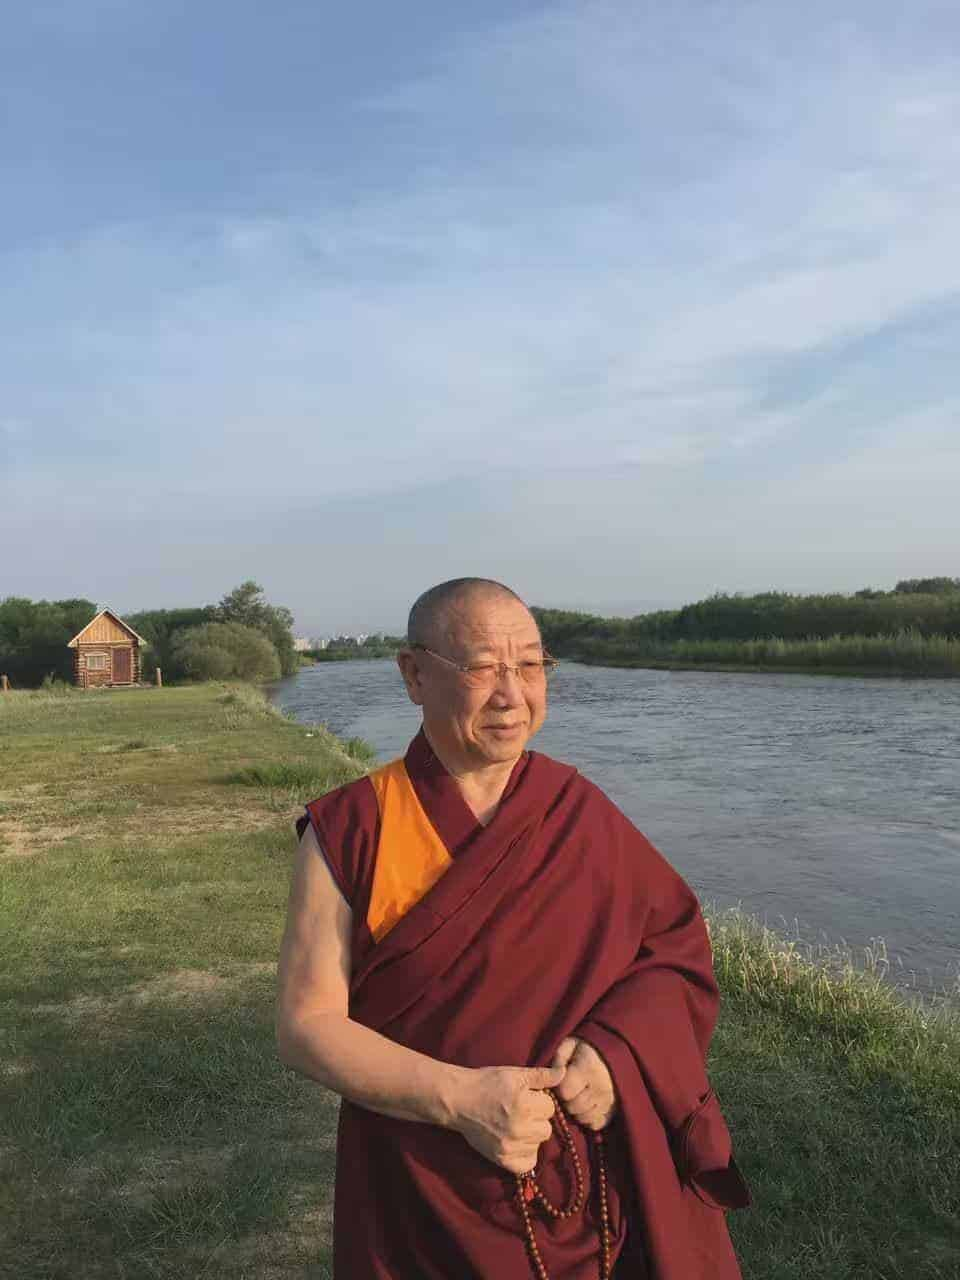 gosok-rinpoche-mongolia-2016-3e3fda1a4c5dbe584af46ffcfbcfed6